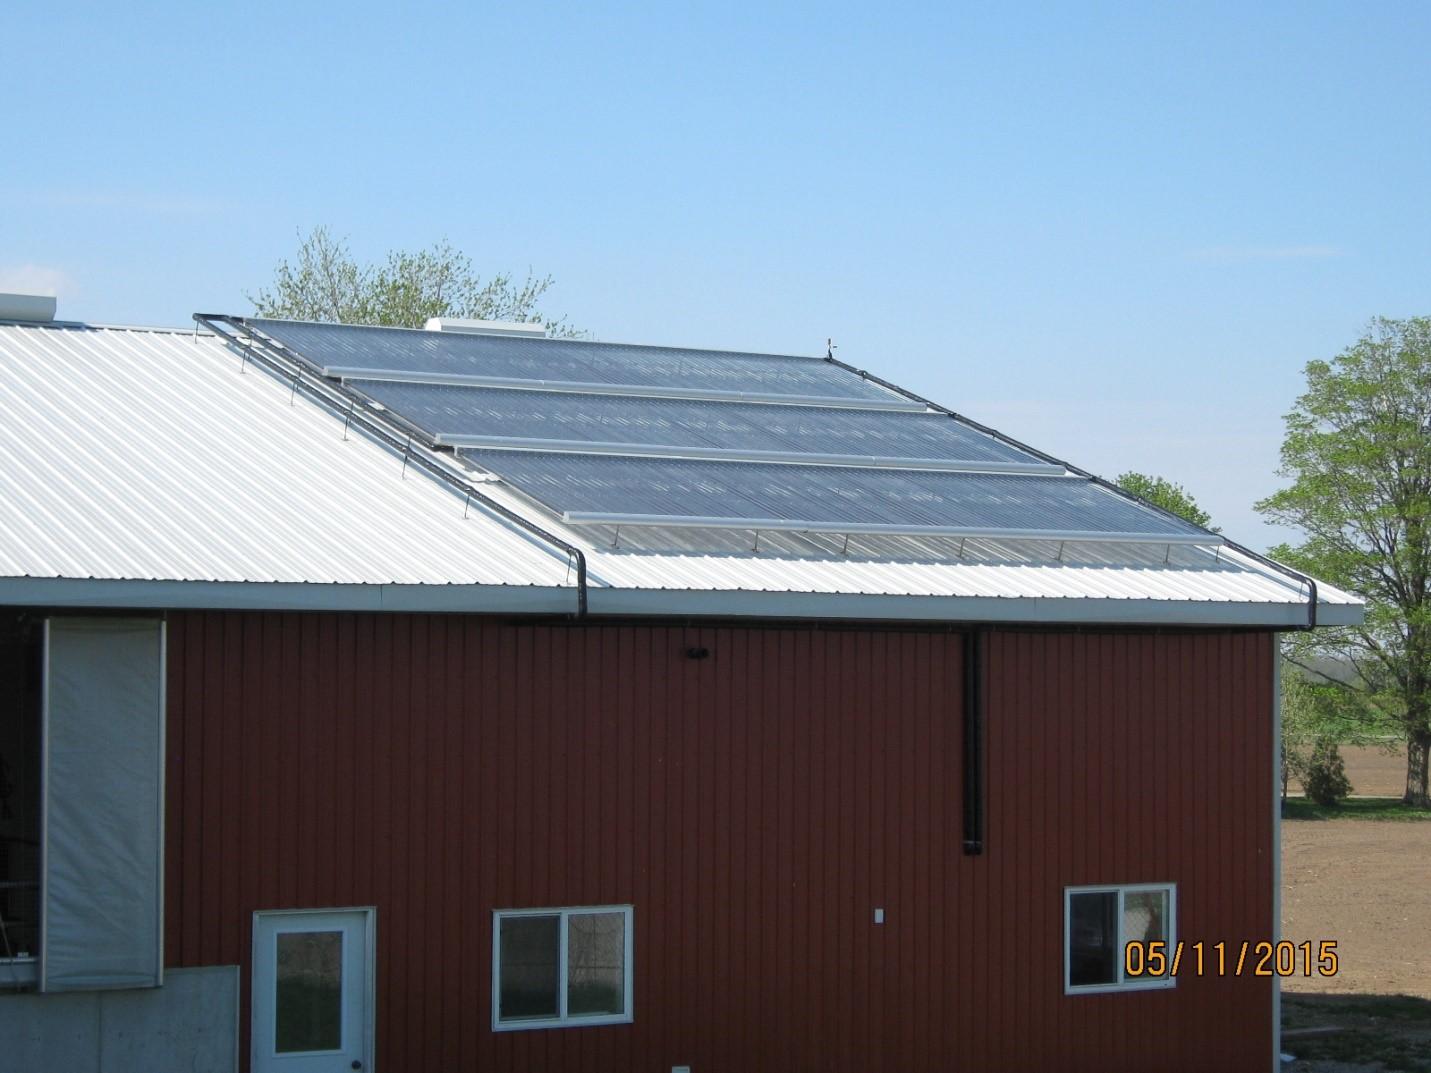 Woodstock, Ontario Solar Water Heating & Cooling Systems - Zolarayz